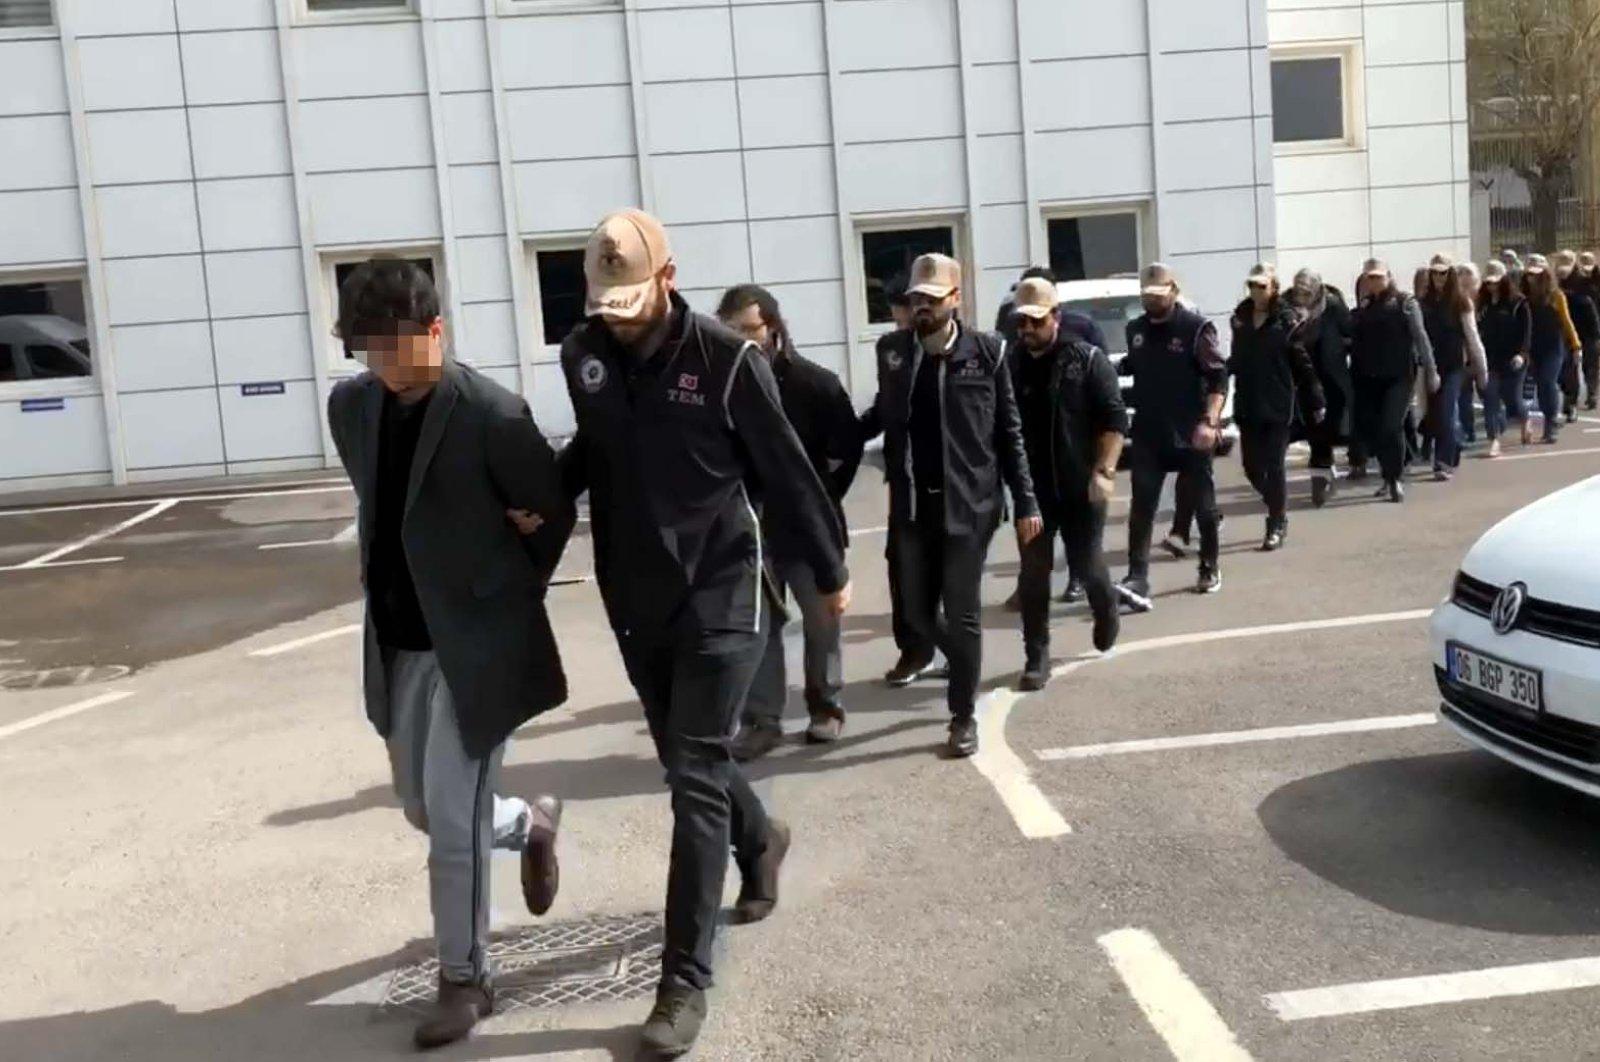 Police escort FETÖ suspects captured in an operation, Ankara, Mar. 9, 2020. (DHA Photo)